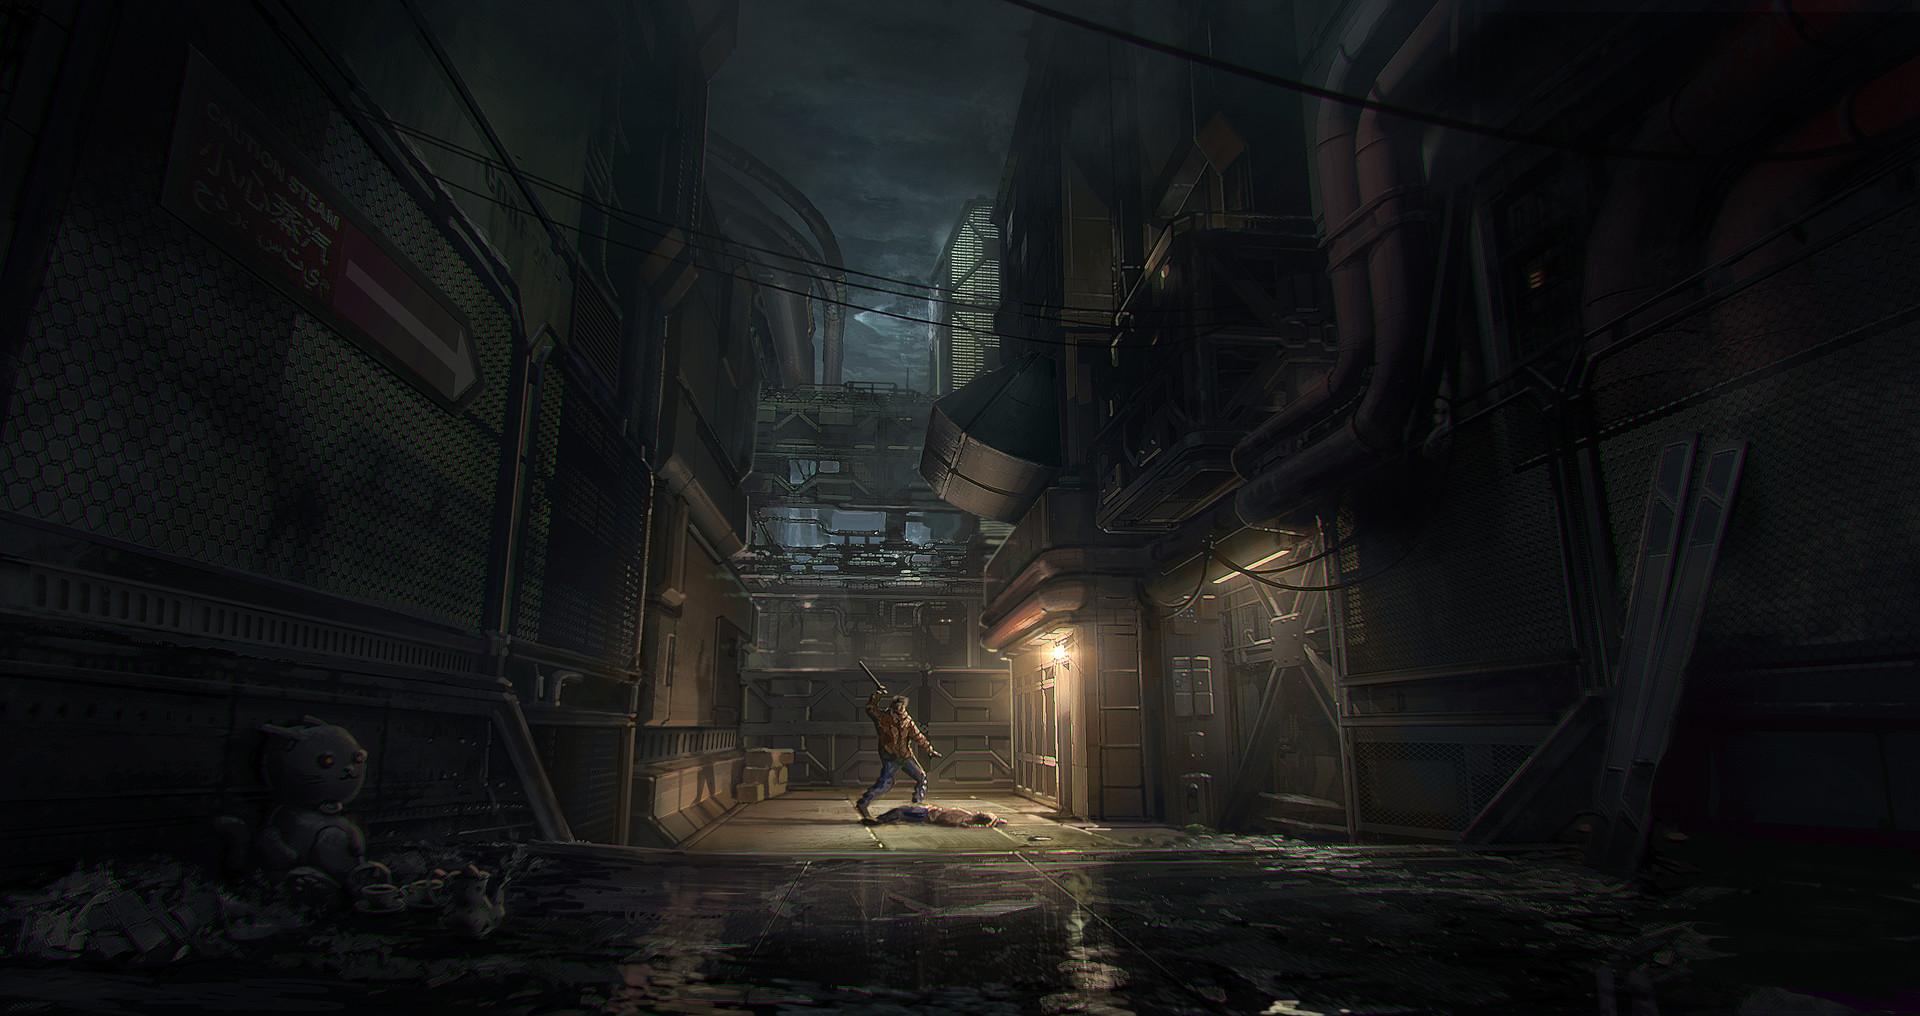 Www Girl Cartoon Wallpaper Com Artstation Blade Runner 2049 Murder Alleyway Concept